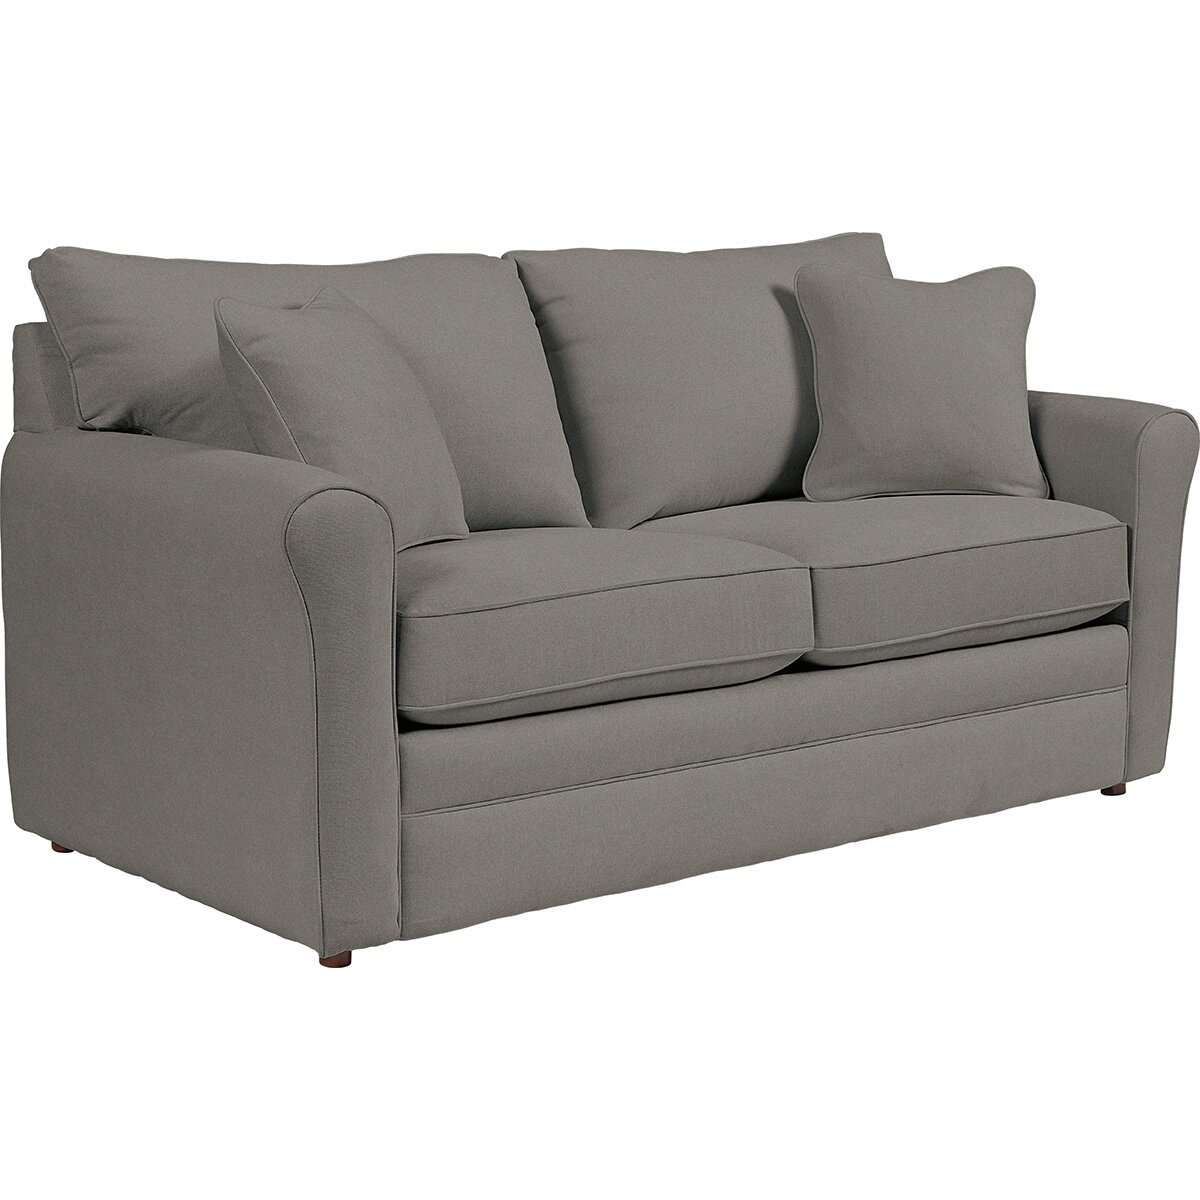 La z boy leah supreme comforttm sleeper sofa wayfair for La z boy sectional sleeper sofa